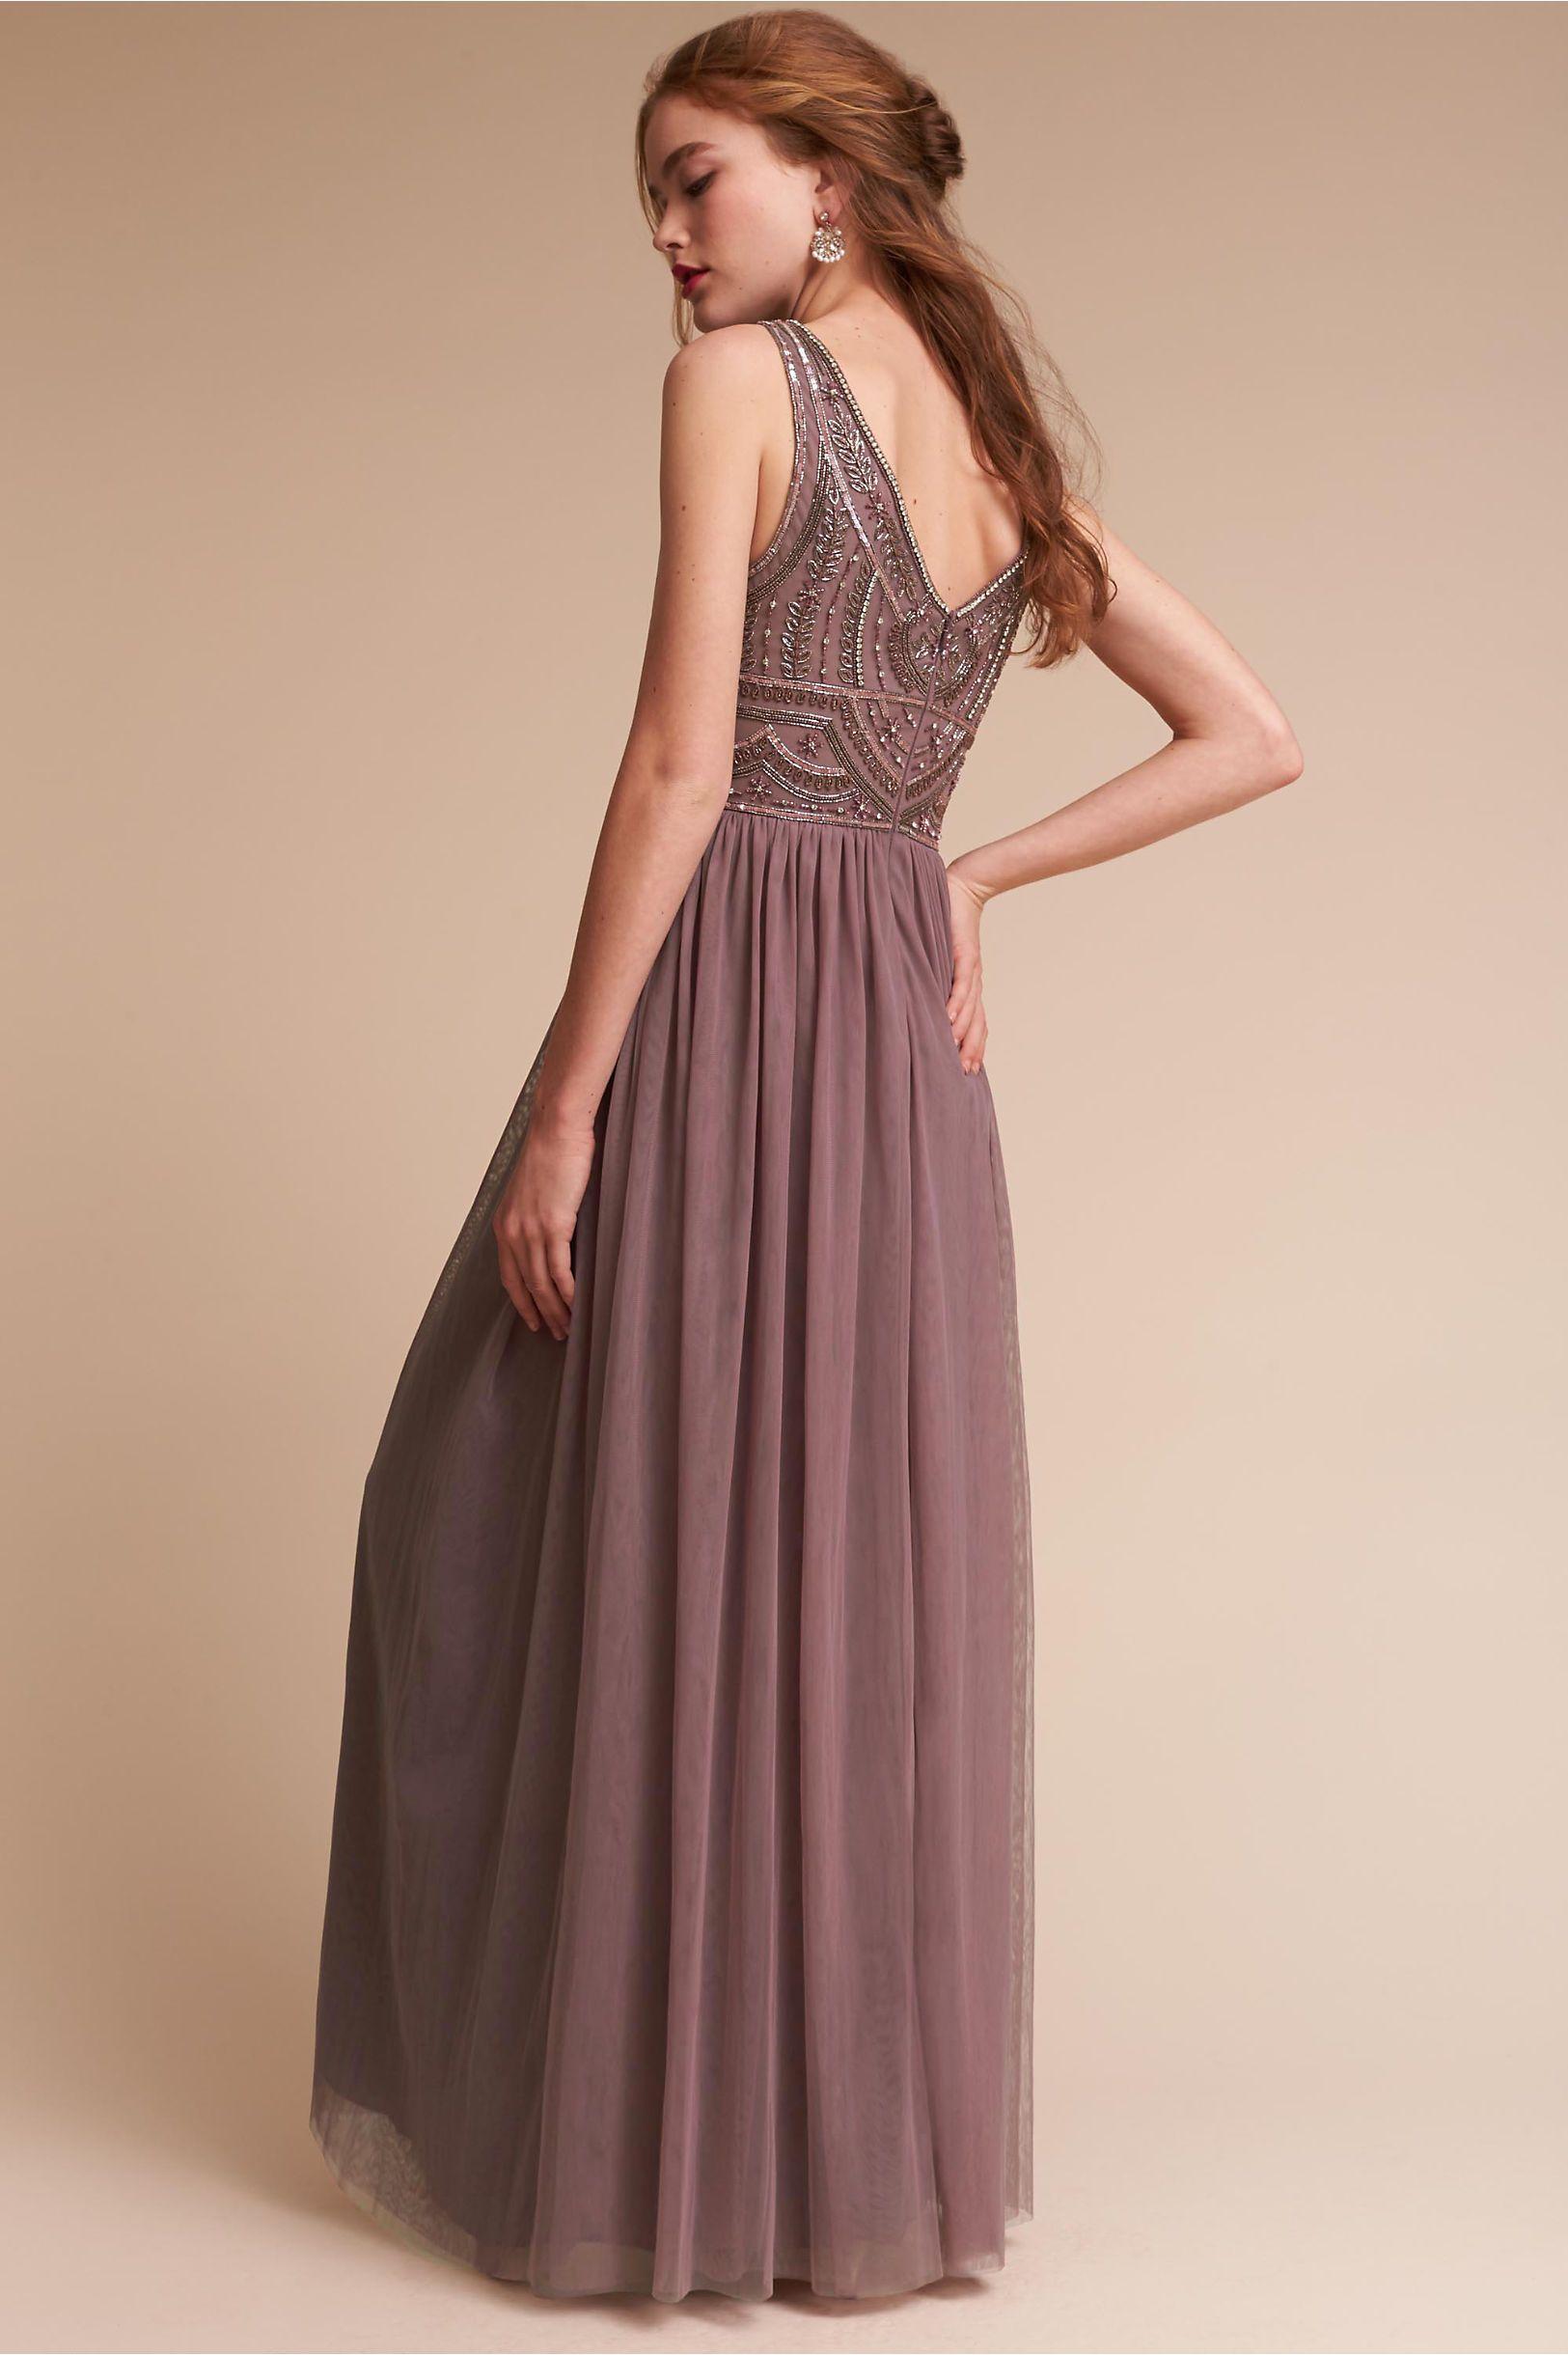 BHLDN Sterling Dress Oyster in Bridal Party   BHLDN   Wedding ...